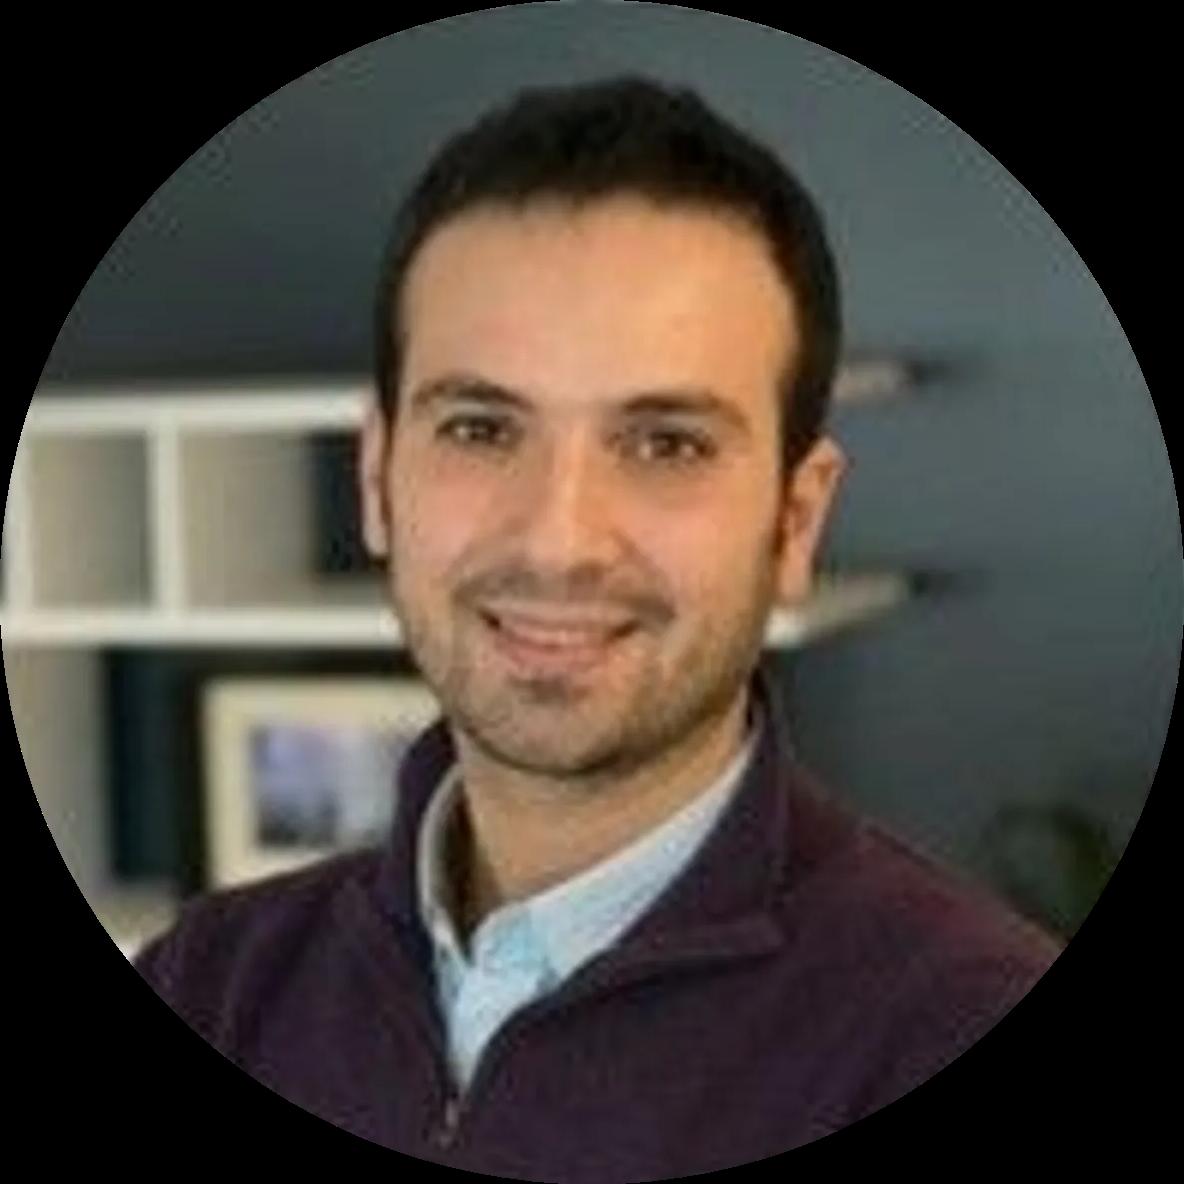 Gioacchino Morsicato – Director of Accounts and Sales